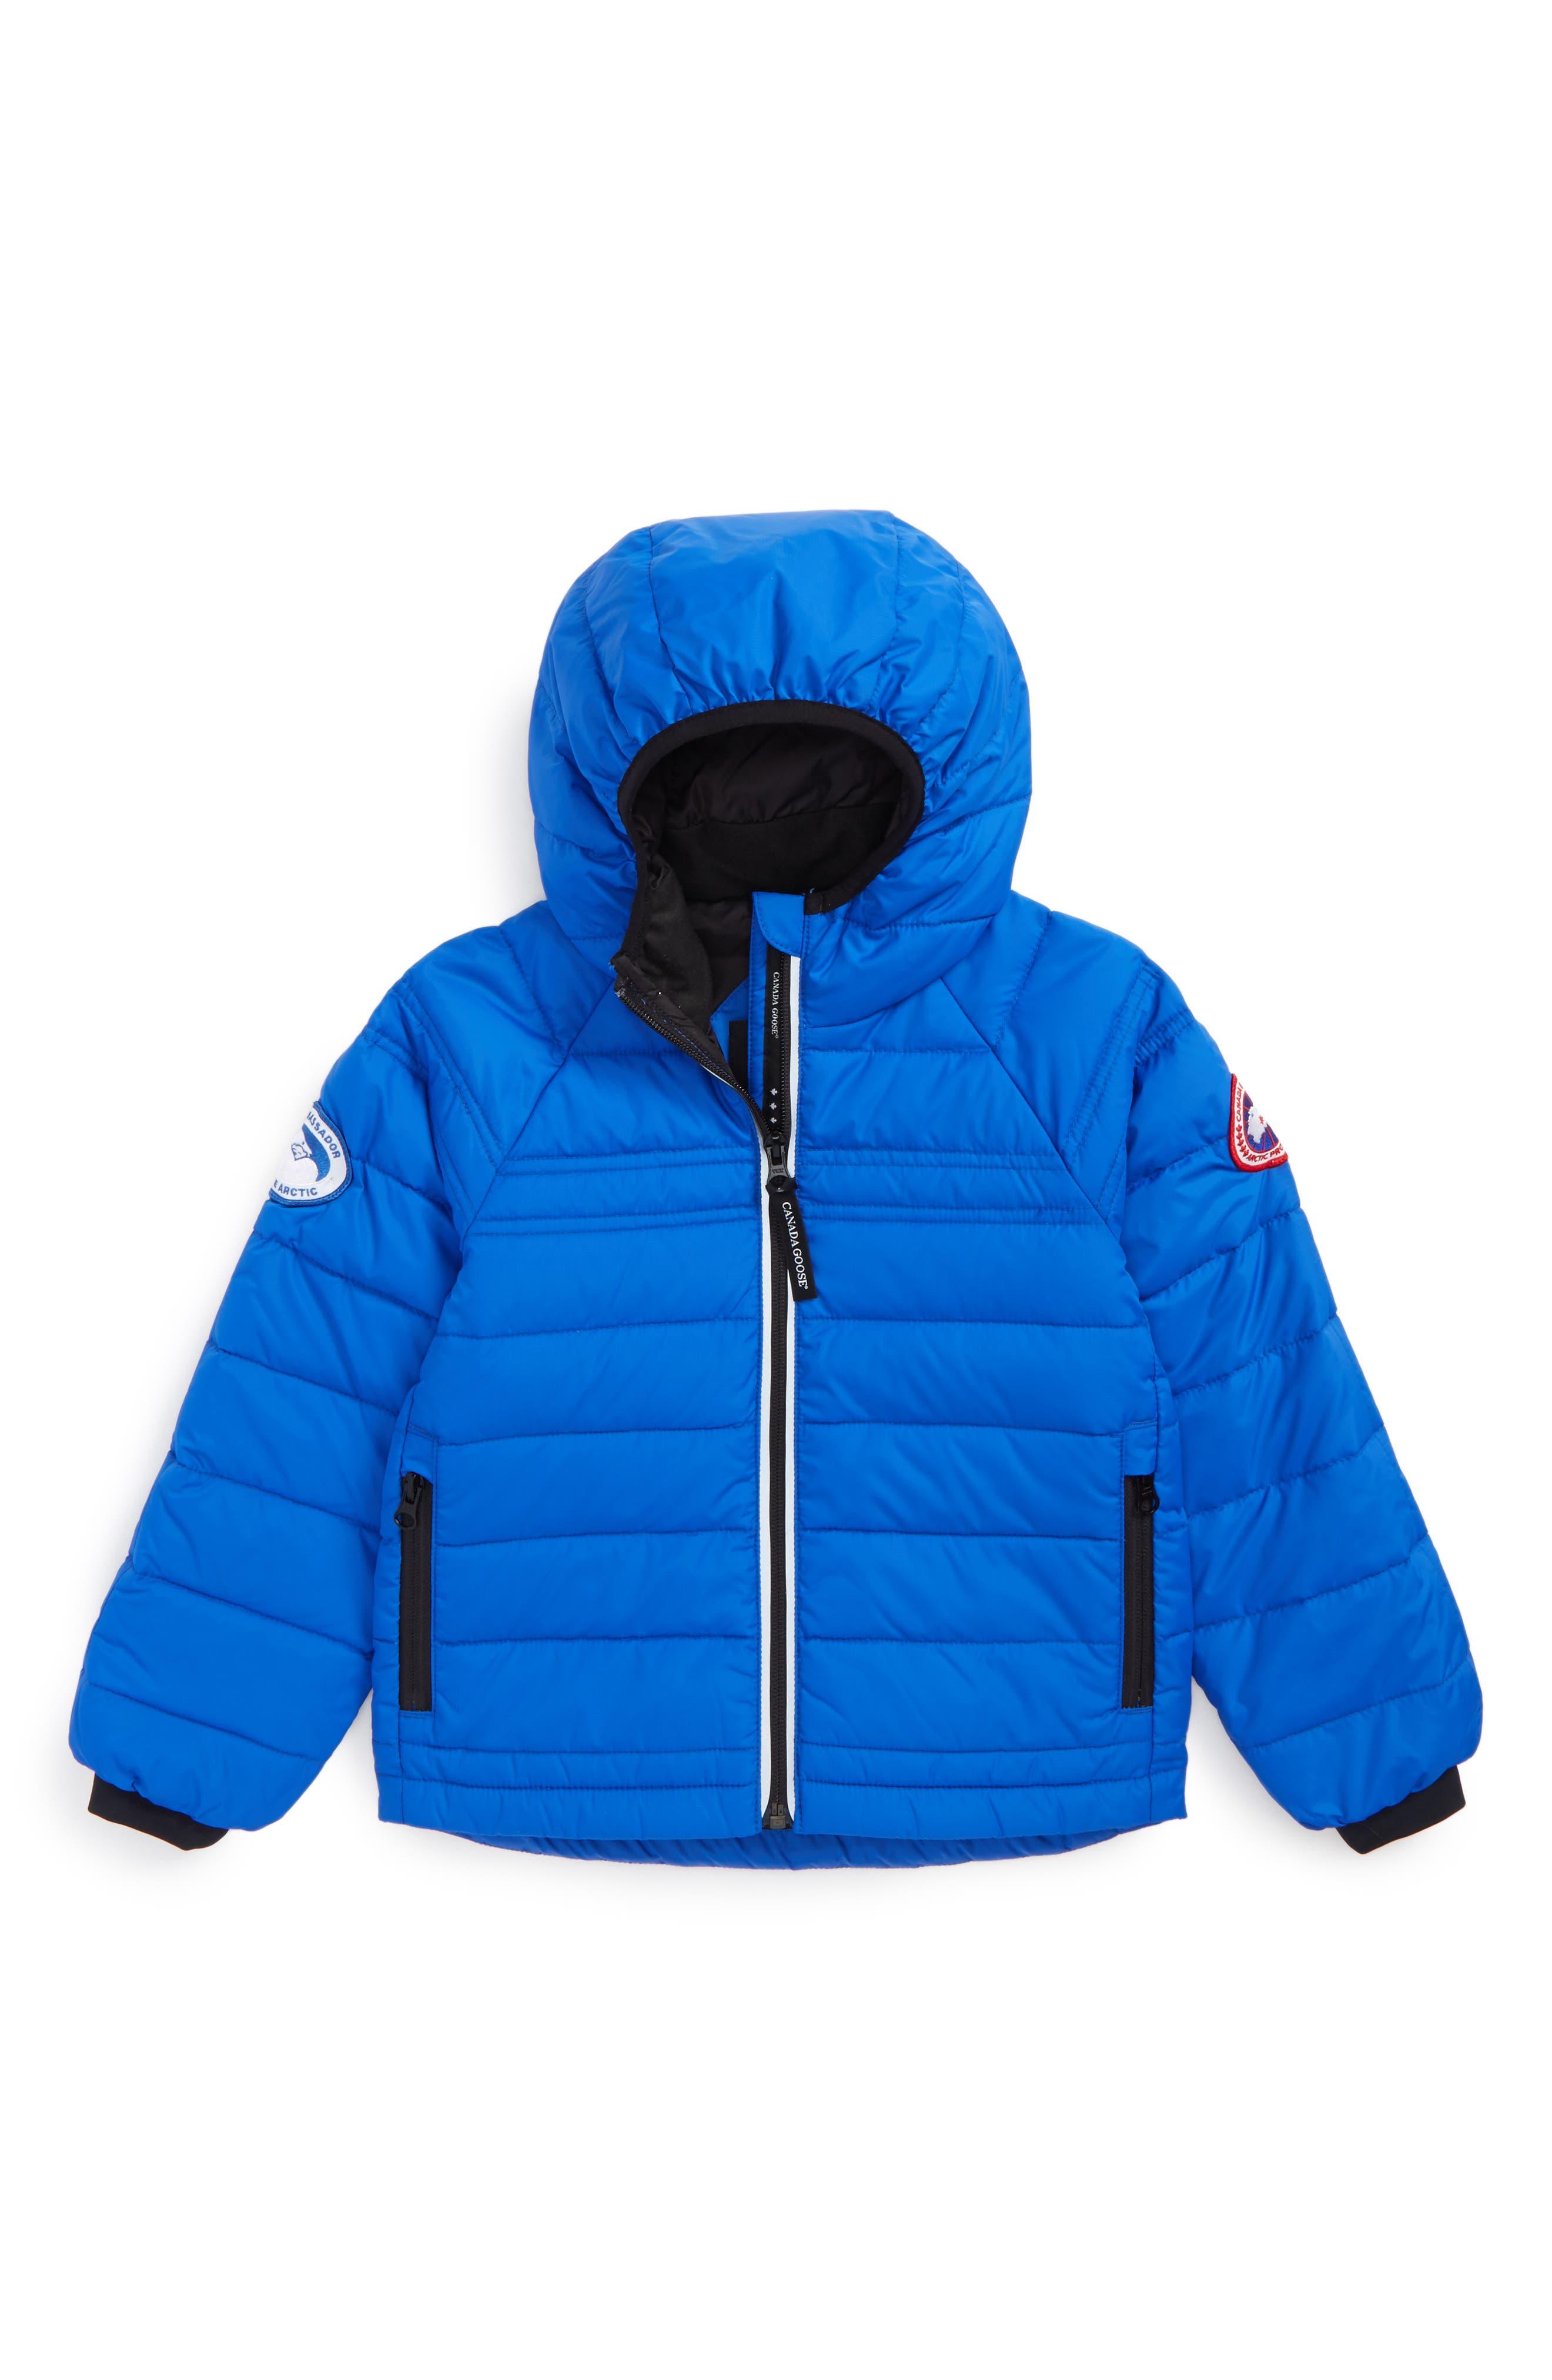 Bobcat Water Resistant Hooded Down Jacket,                         Main,                         color, Pbi Blue